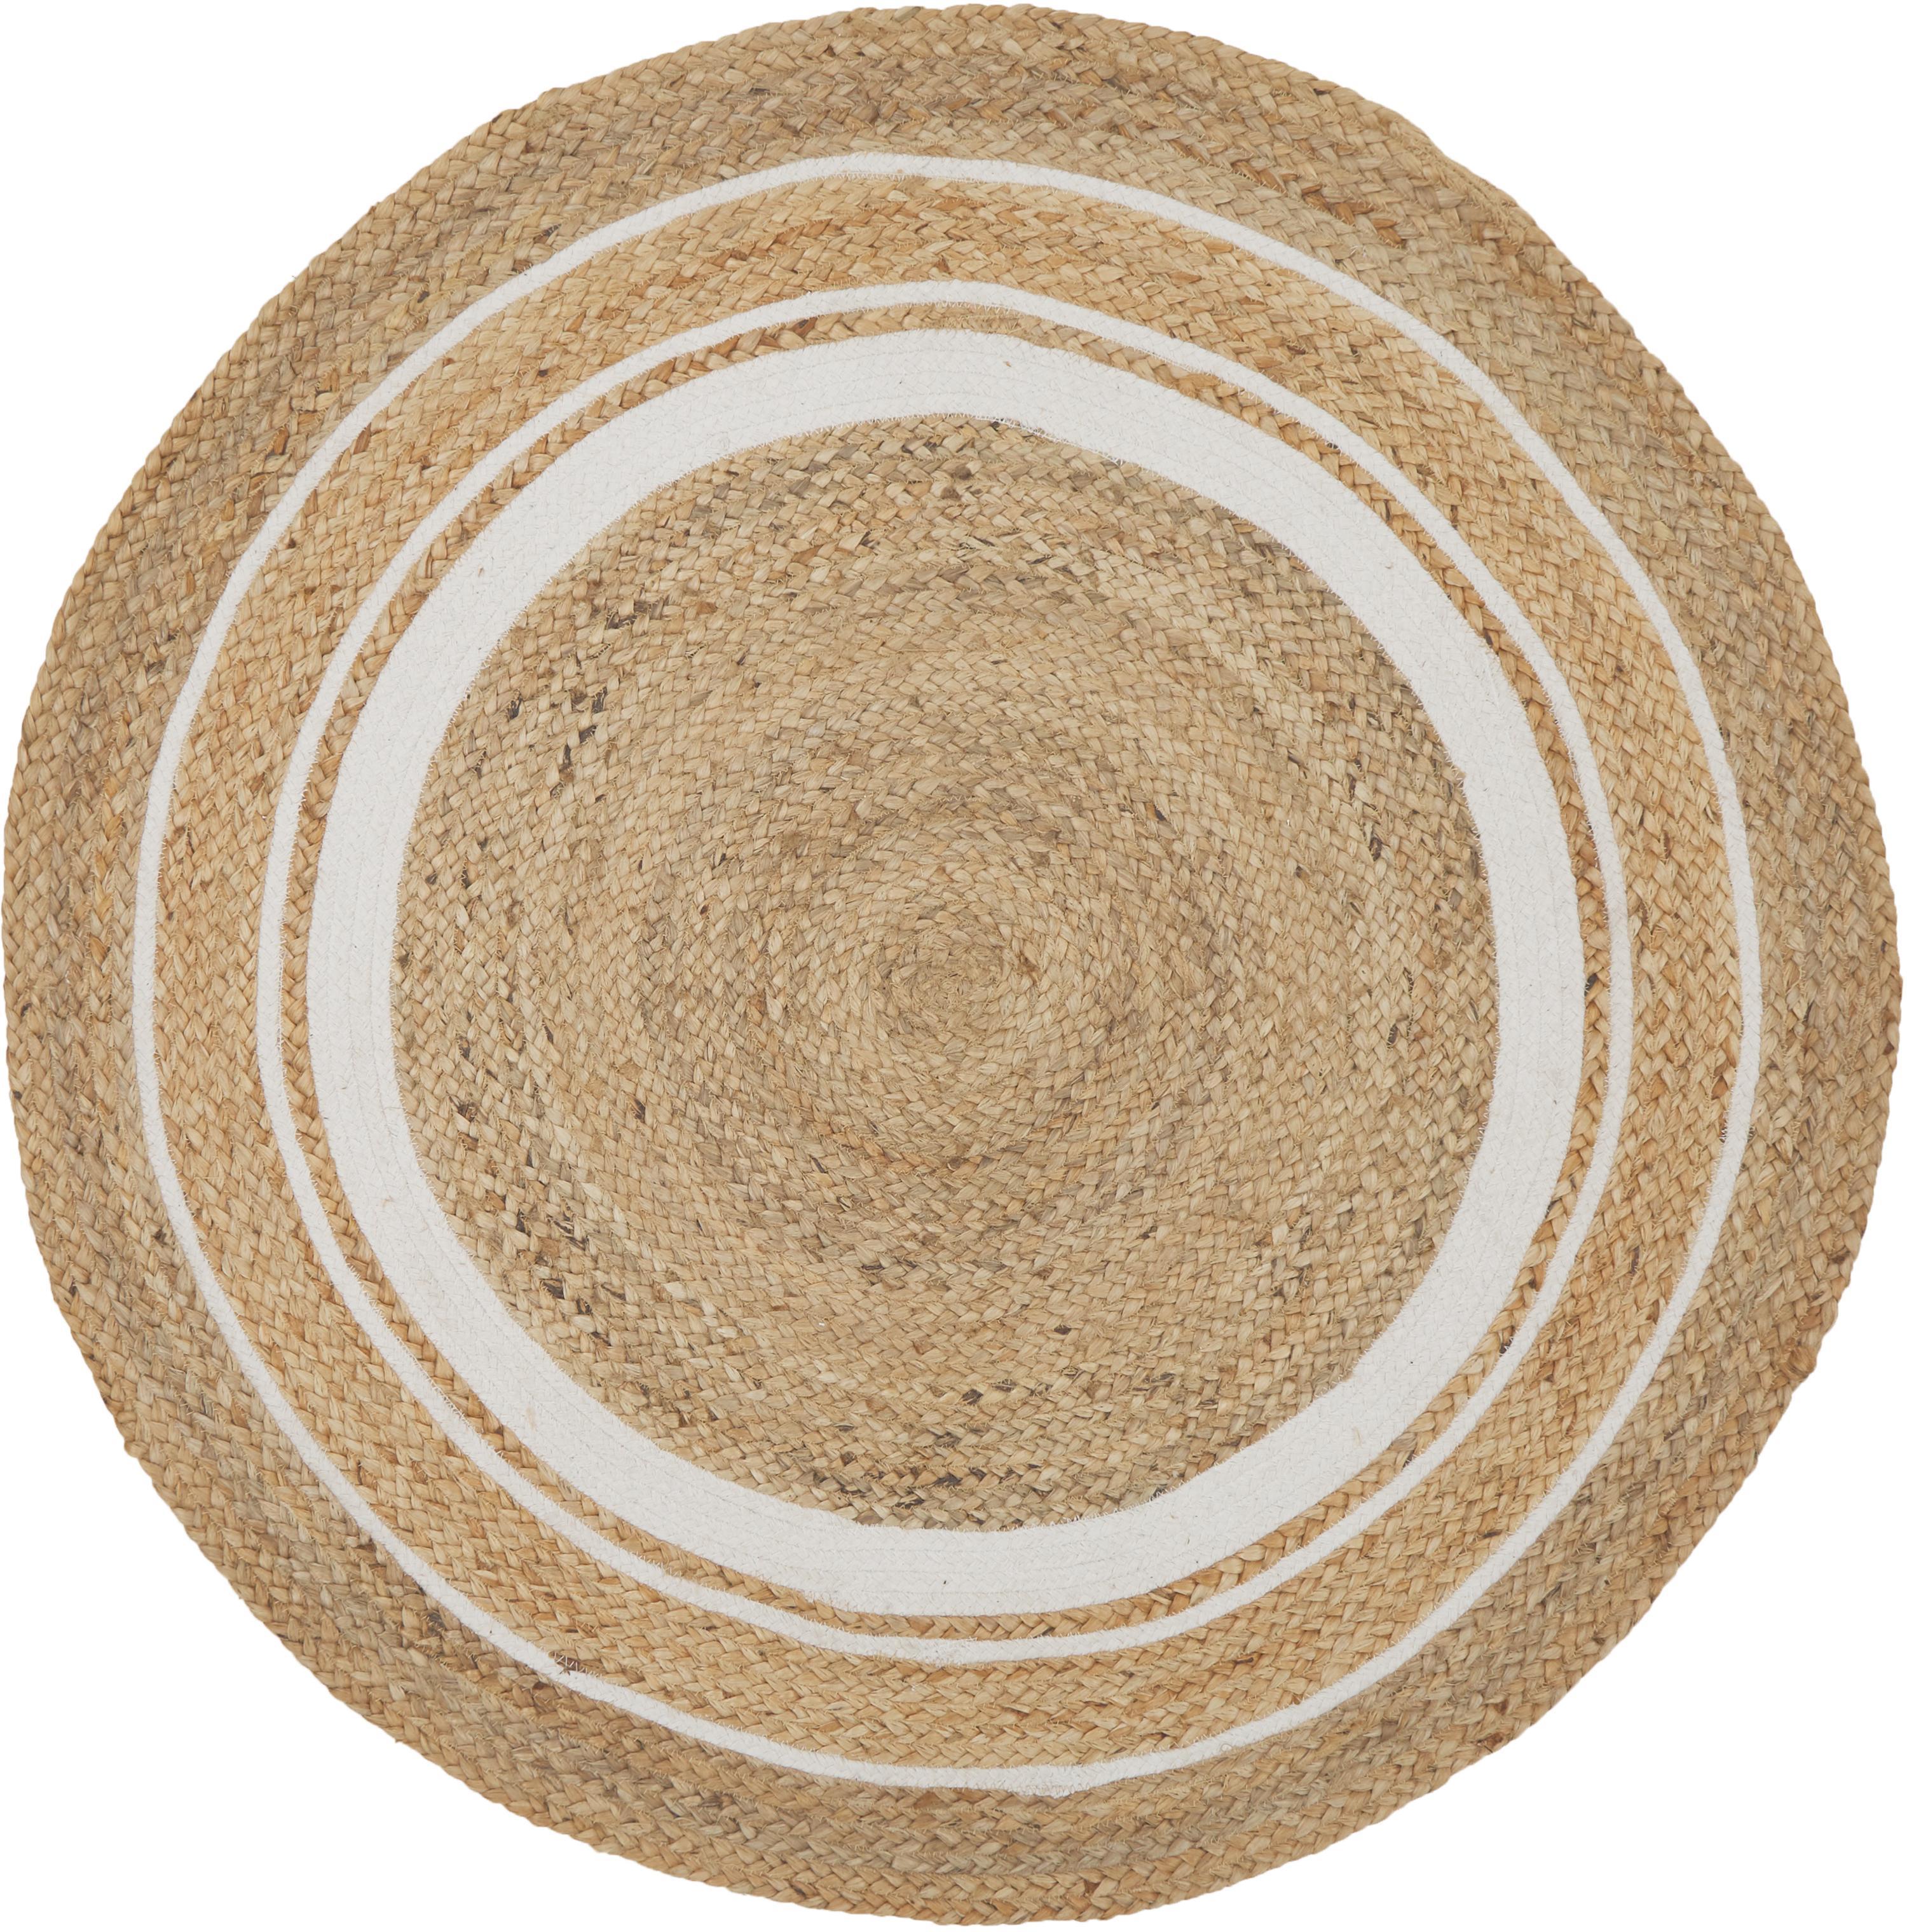 Handgefertigter Jute-Teppich Clover, 75 % Jute, 24 % Baumwolle, 1 % Polyester, Beige, Weiss, Ø 120 cm (Grösse S)